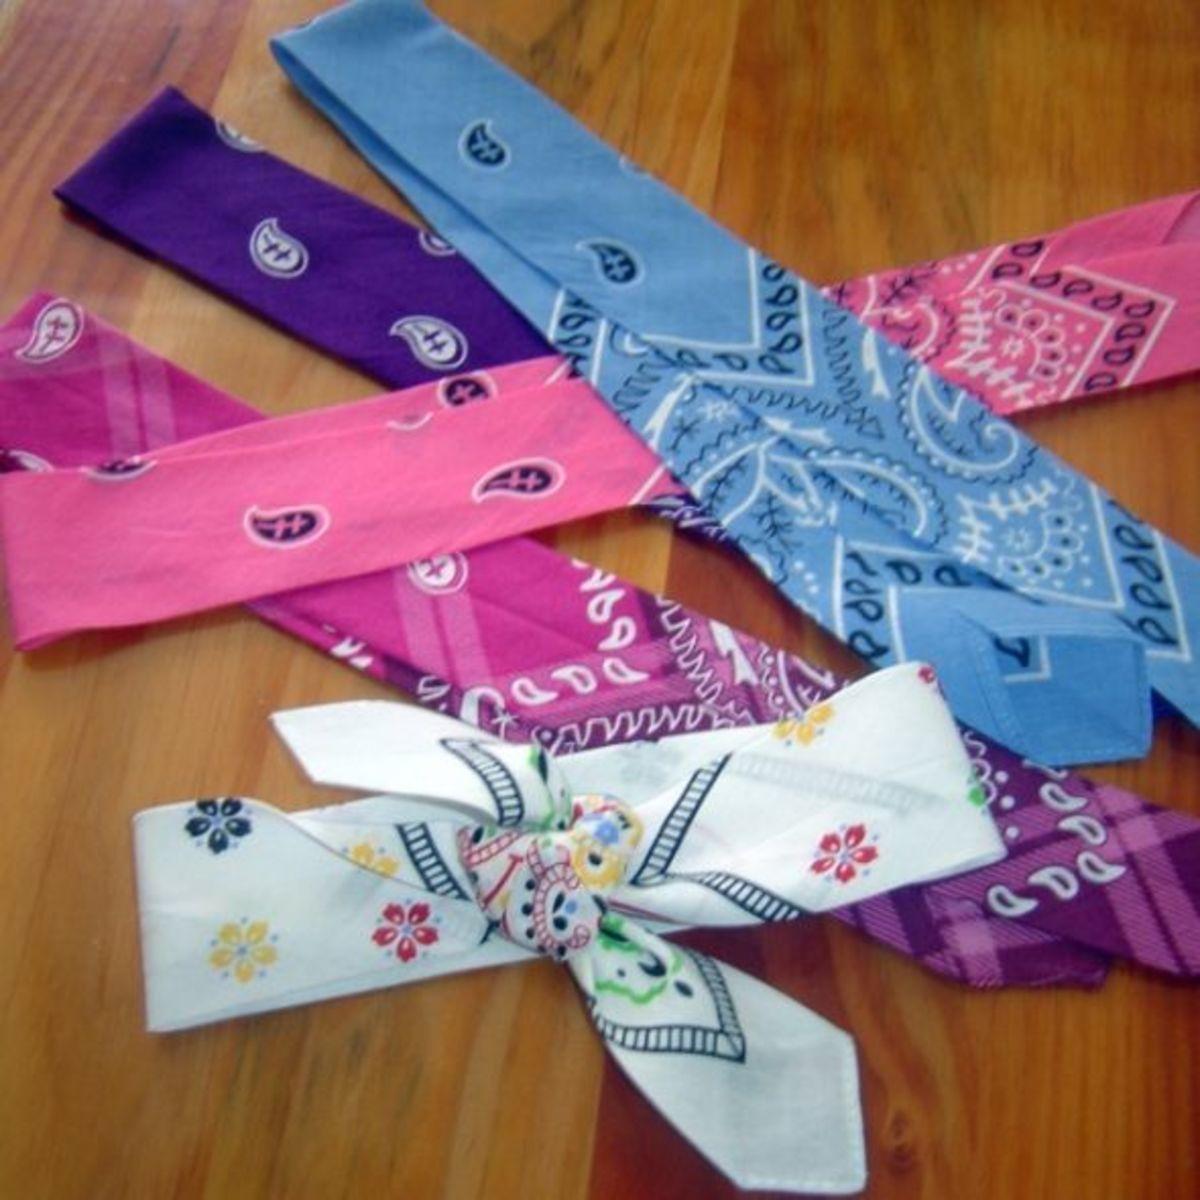 Small Gift Ideas - Hair Bandana Ties